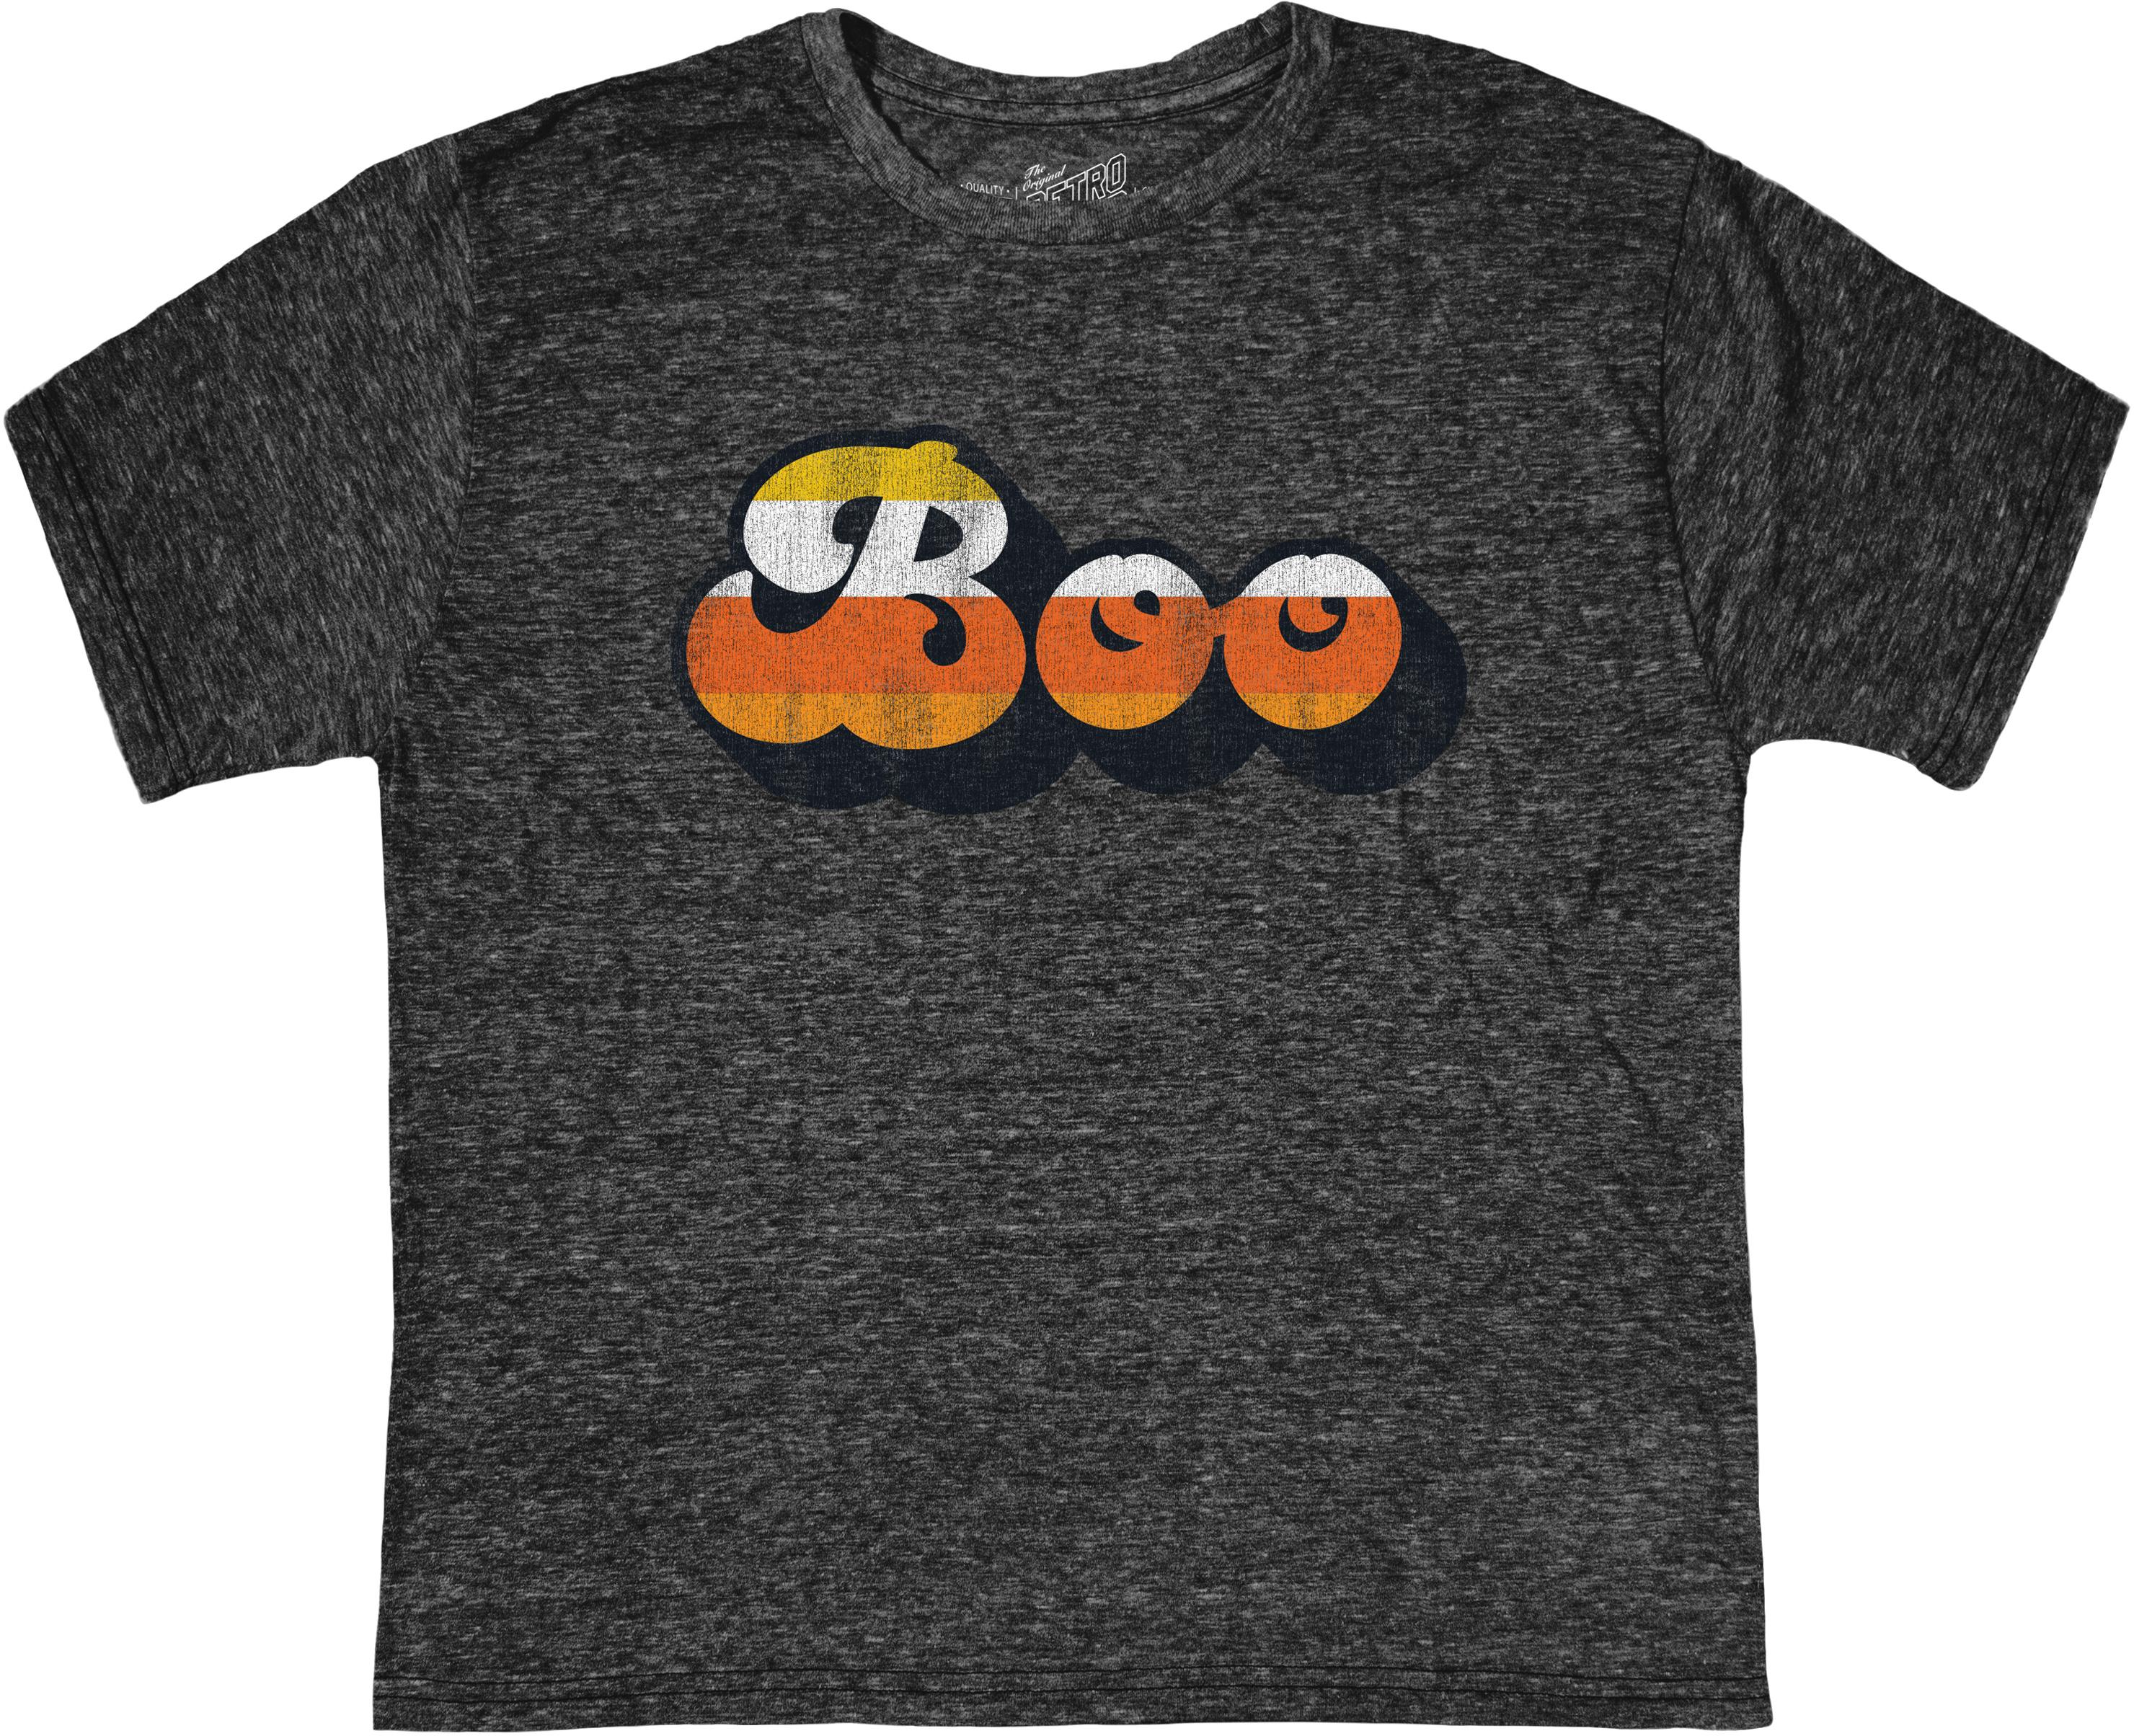 Футболка с круглым вырезом Tri-Blend Boo на Хэллоуин (для детей) The Original Retro Brand Kids